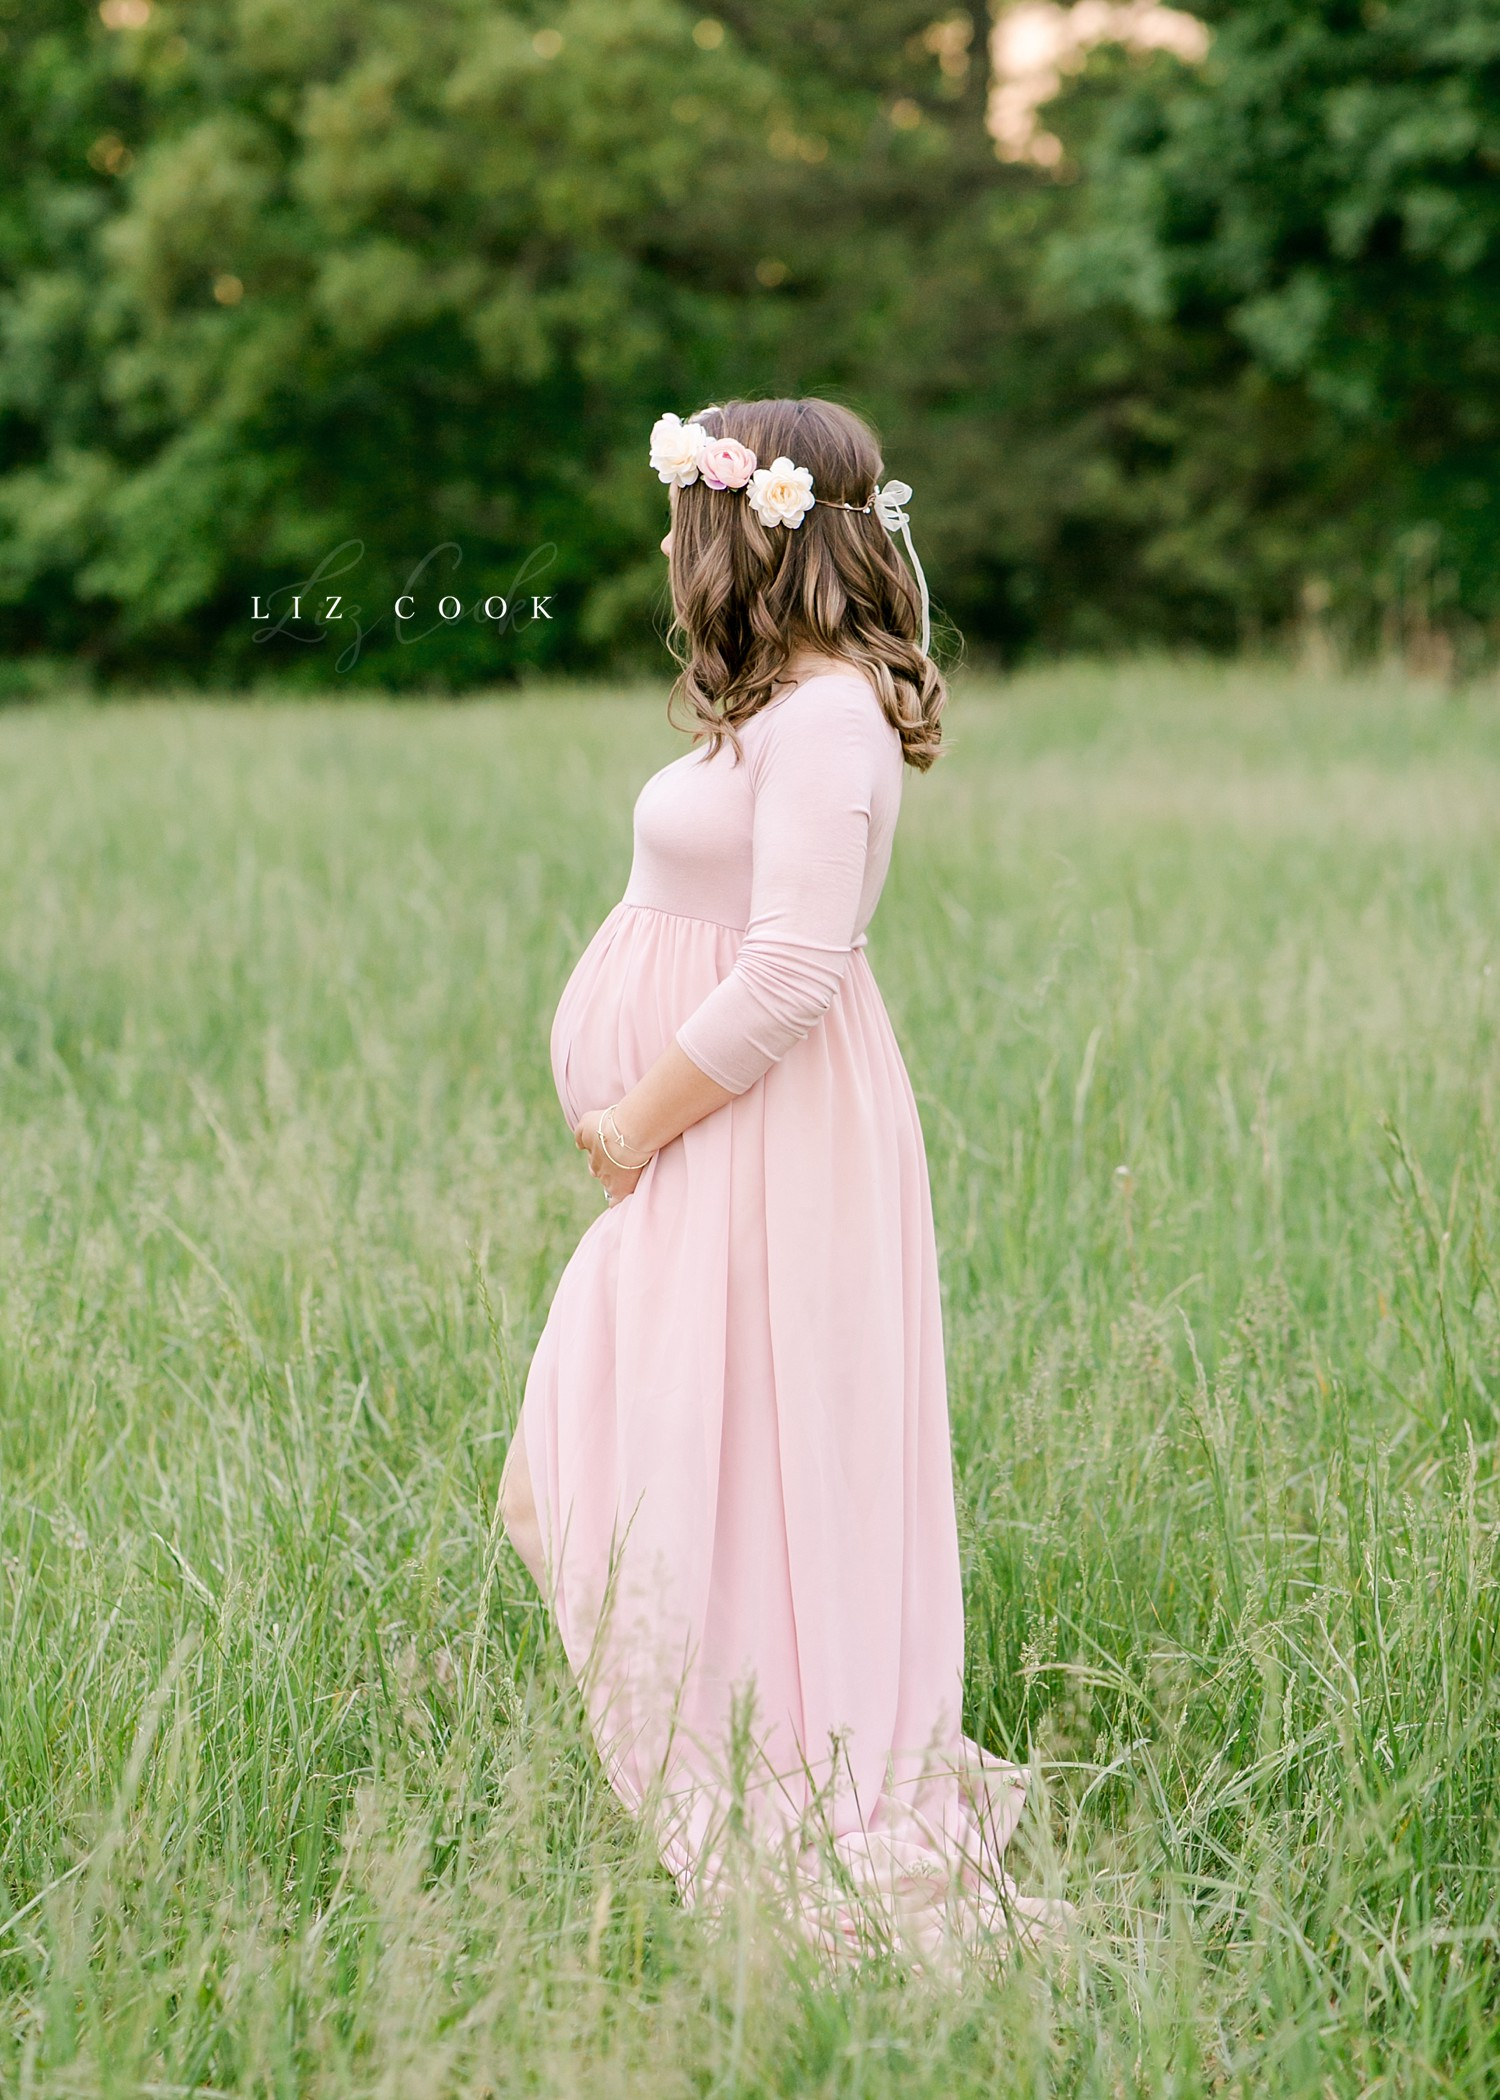 lynchburg_virginia_maternity_photography_pictures_0010.jpg